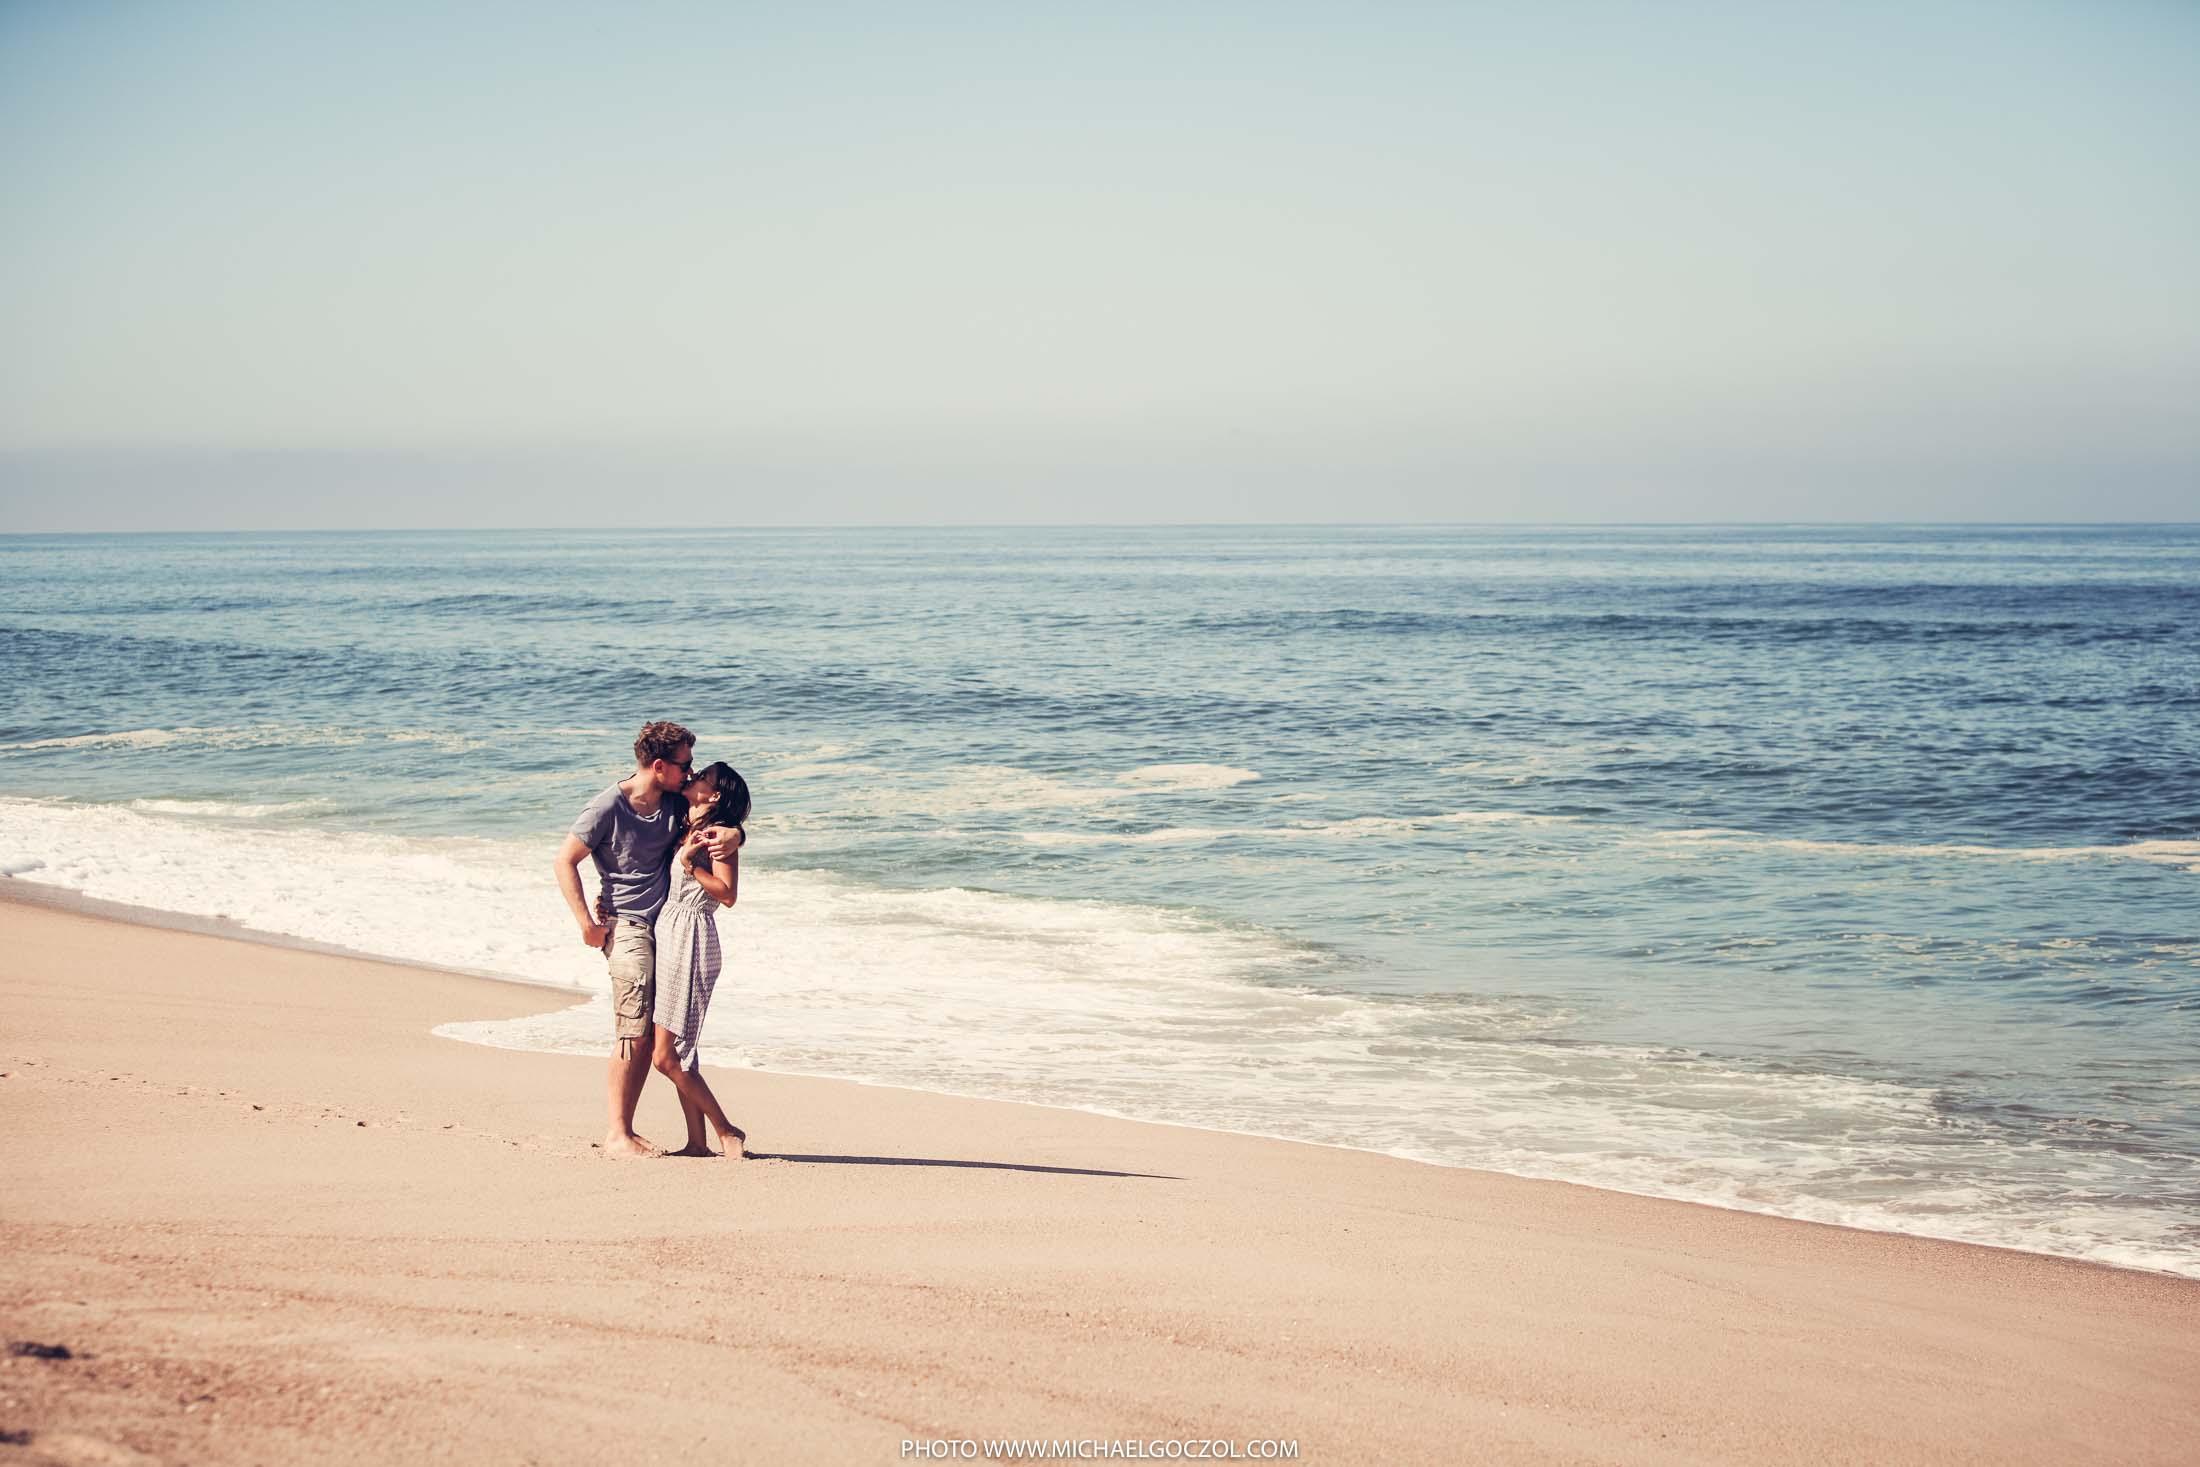 Engagementfotos-Engagementfotografie-Engagement-Engagementshooting-Kennenlernshooting-Verlobungsshooting-Hochzeit-Prewedding-Shooting-Fotoshooting-025